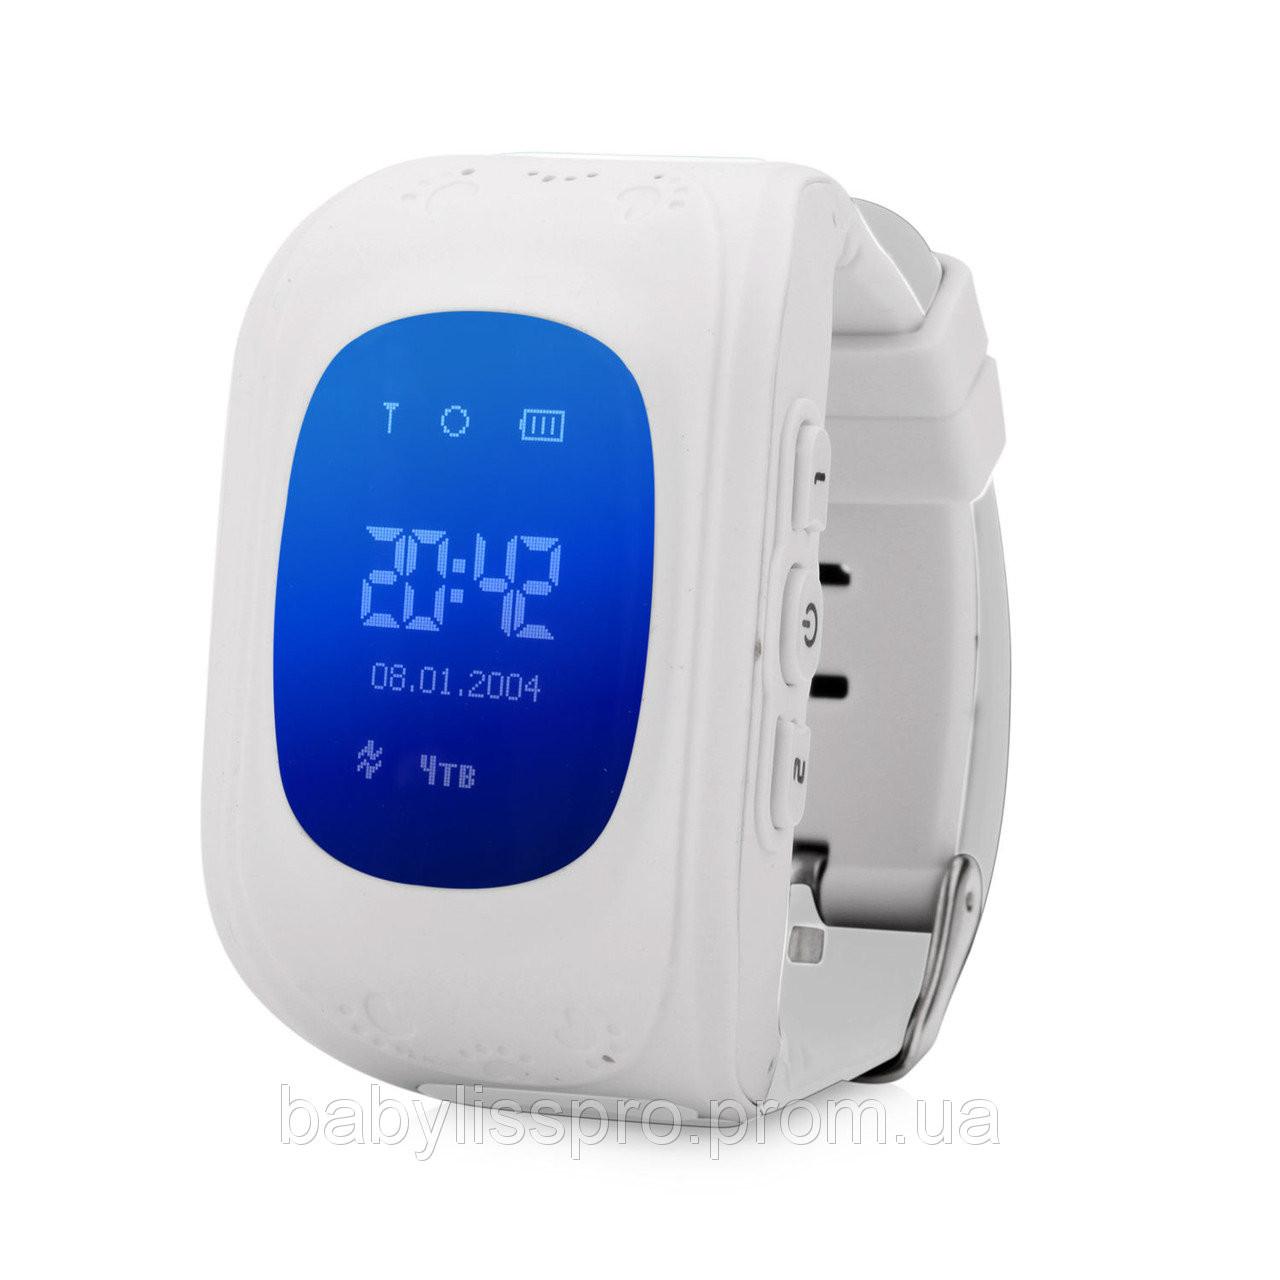 Детские умные часы Q50 White